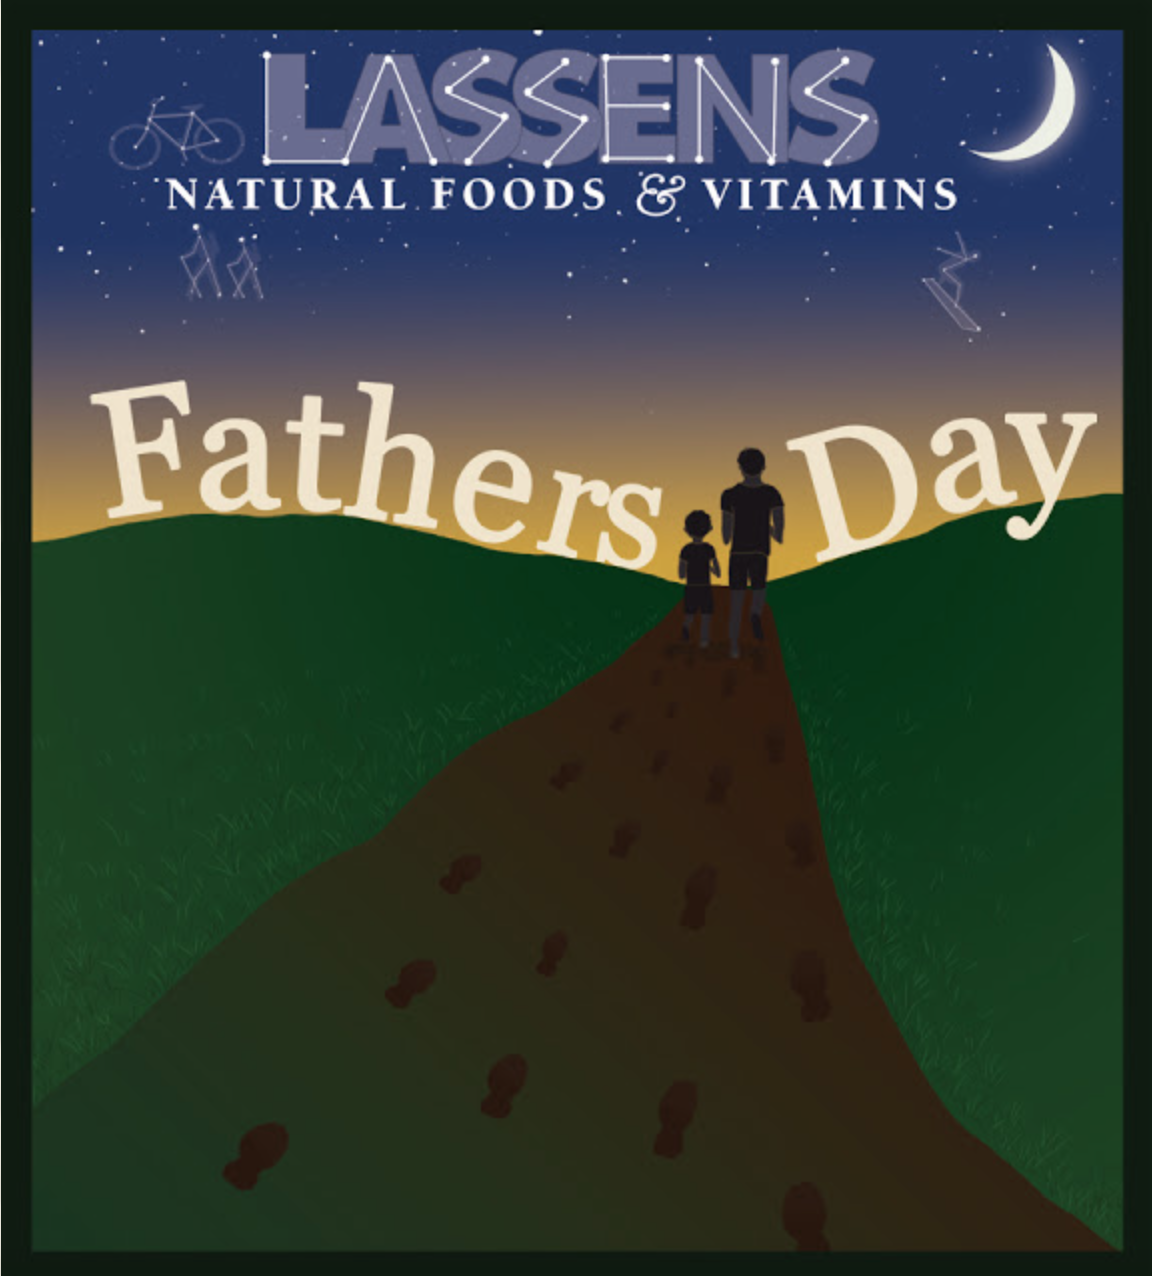 gifts+for+father's+day, father's+day, gifts+for+dad